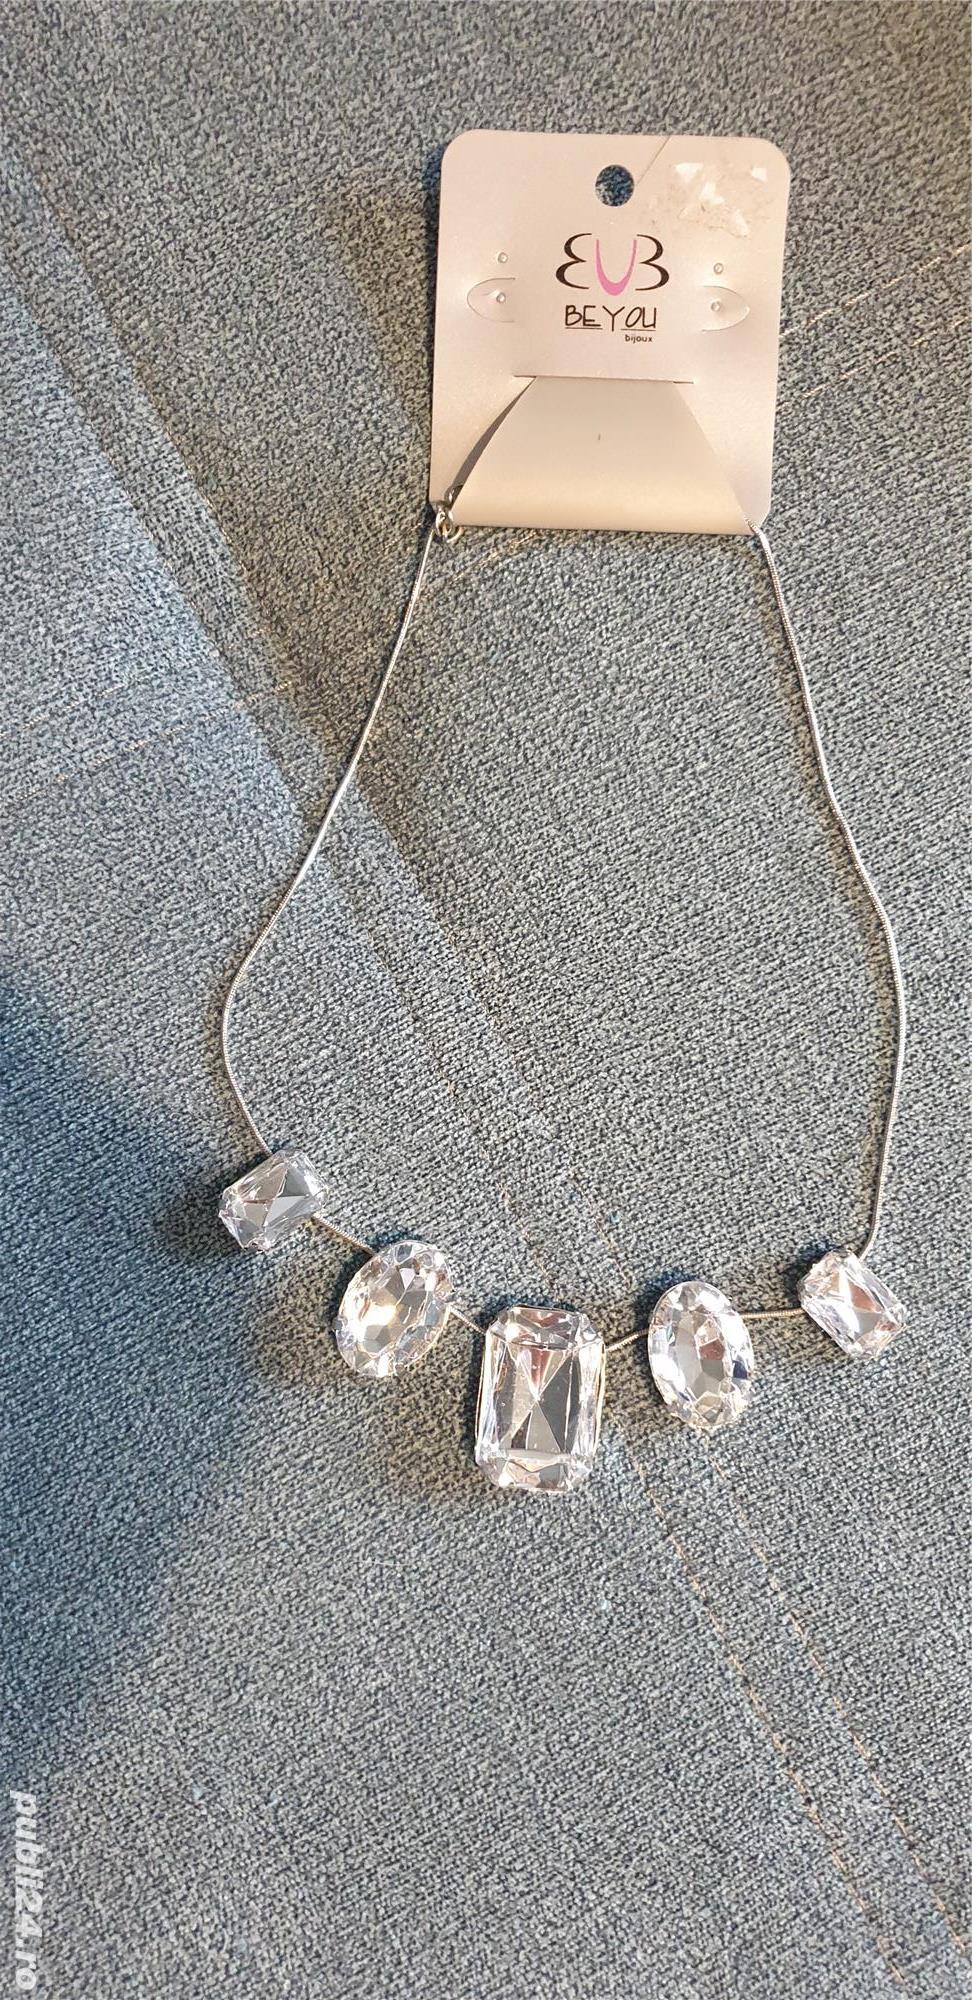 Colier argintiu cu pietre zirconiu